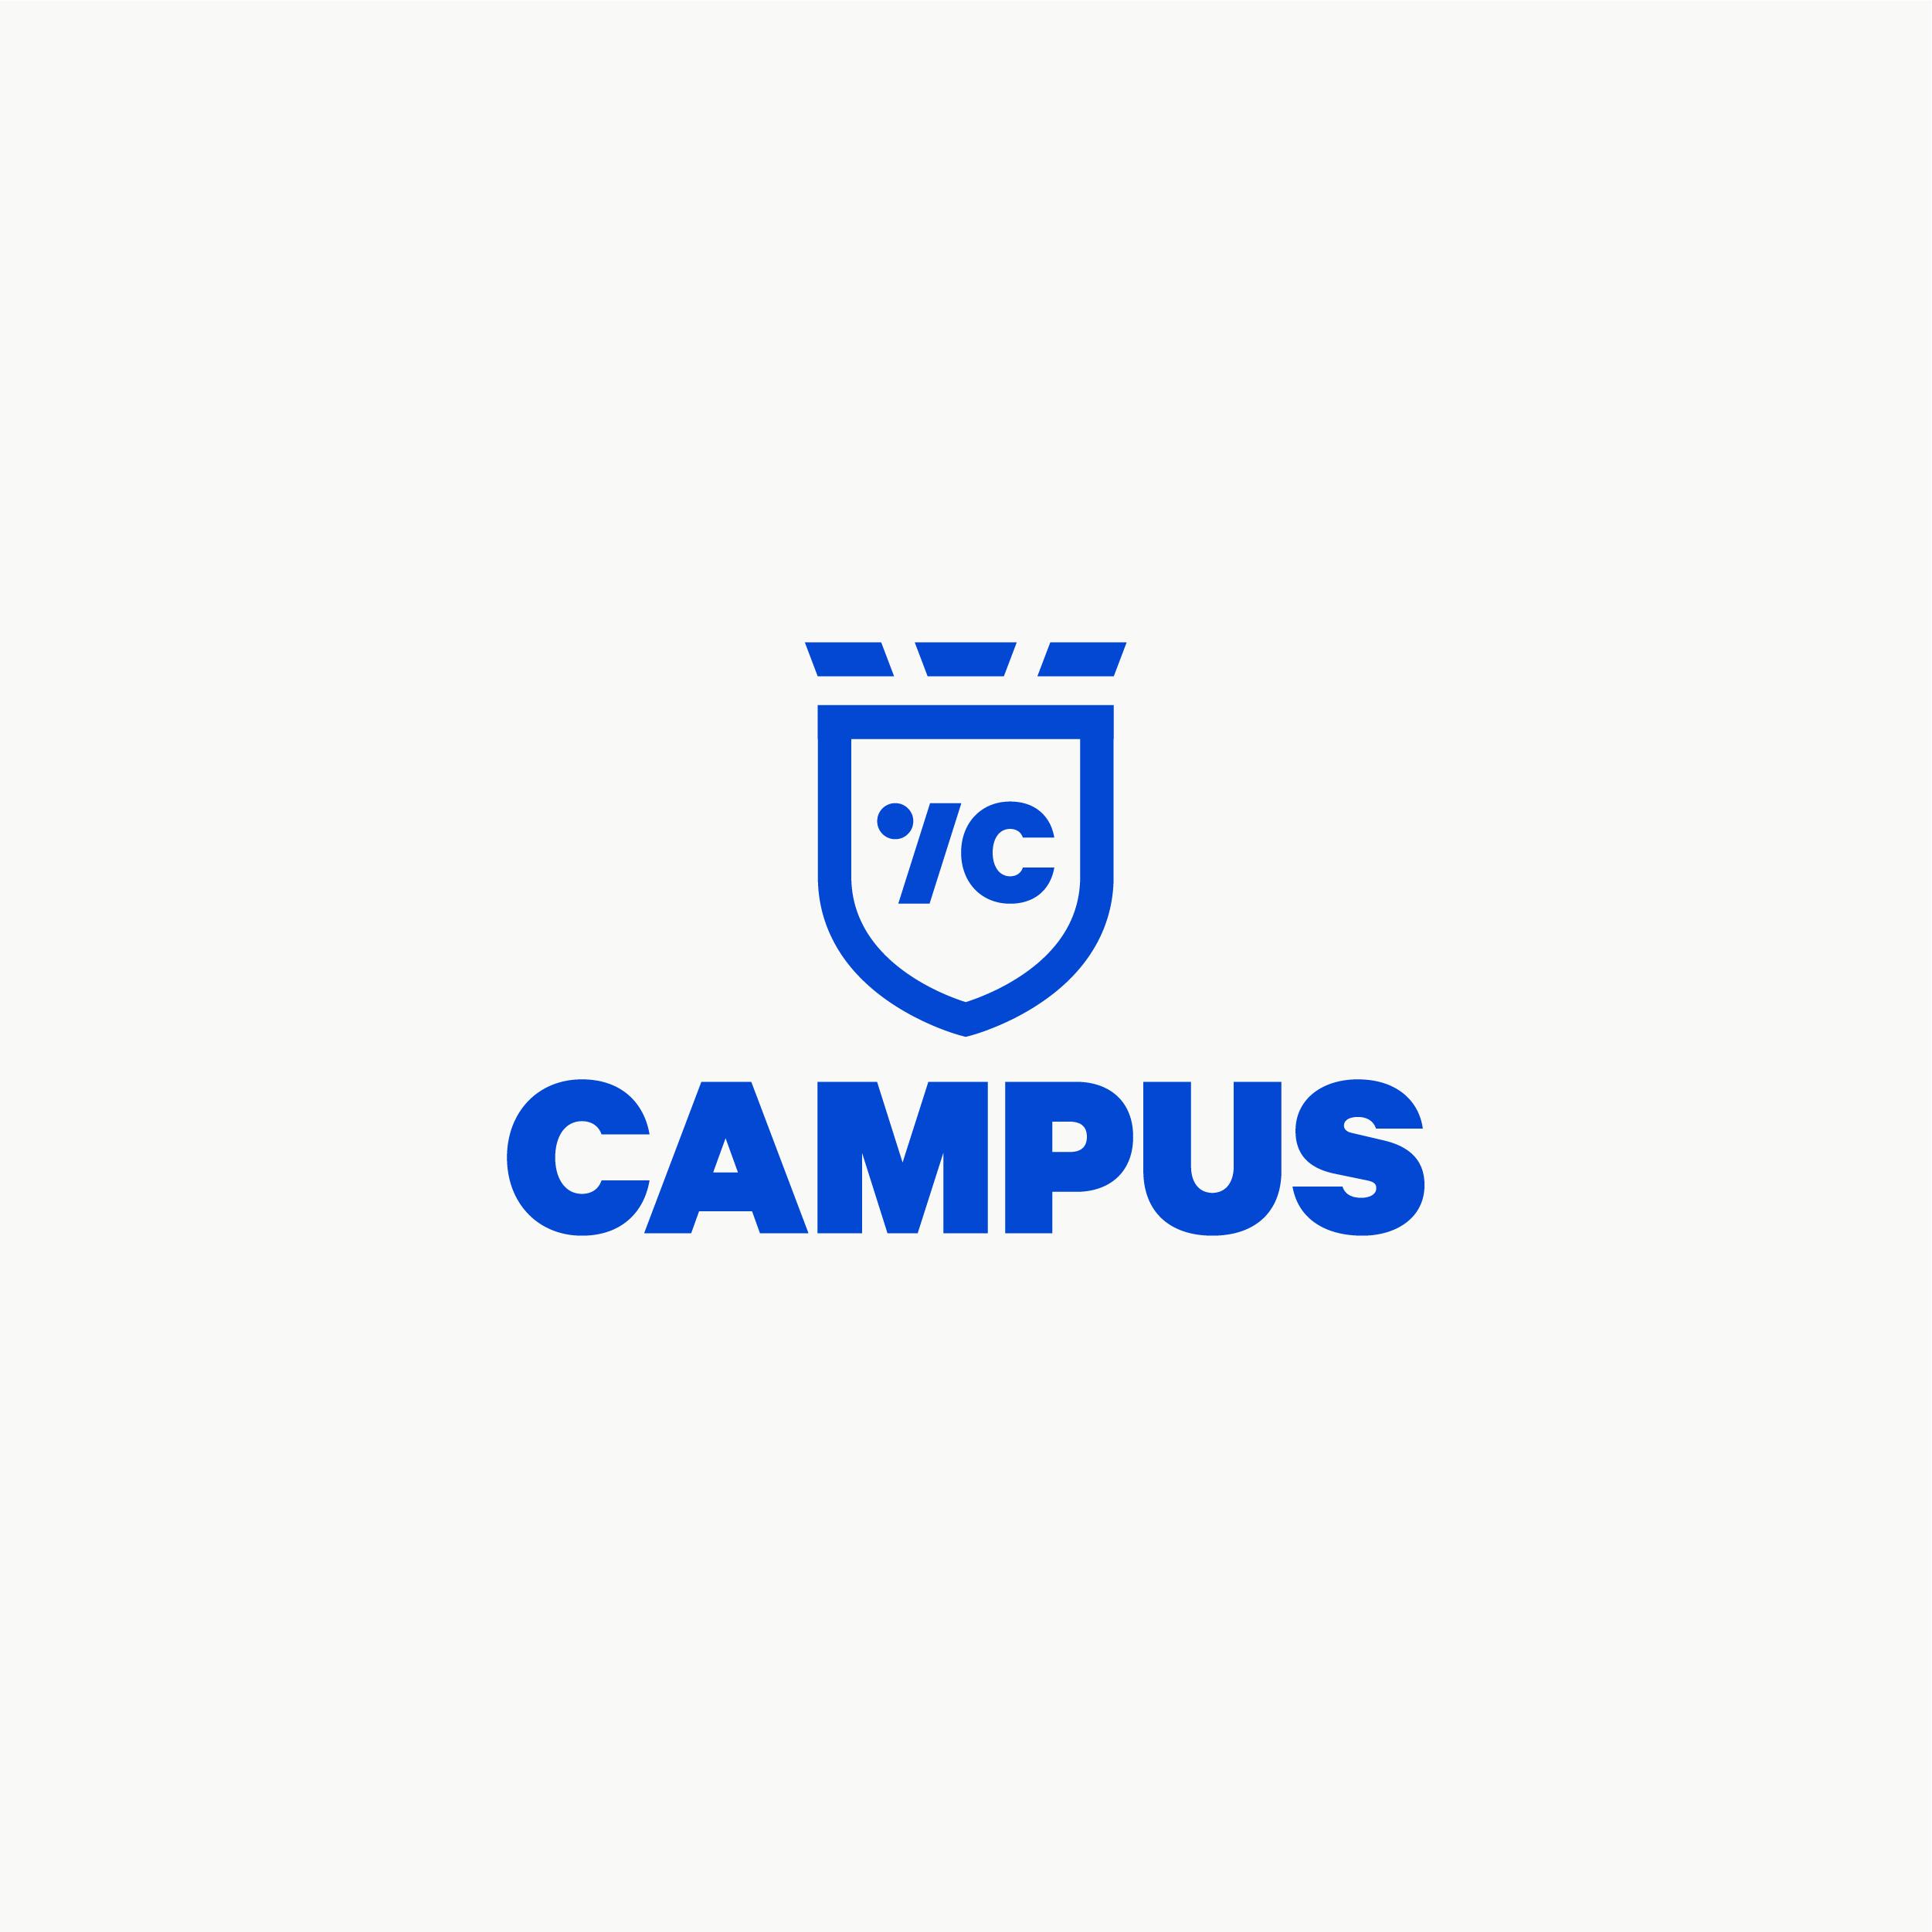 TBS_LogosMarks_Campus_2